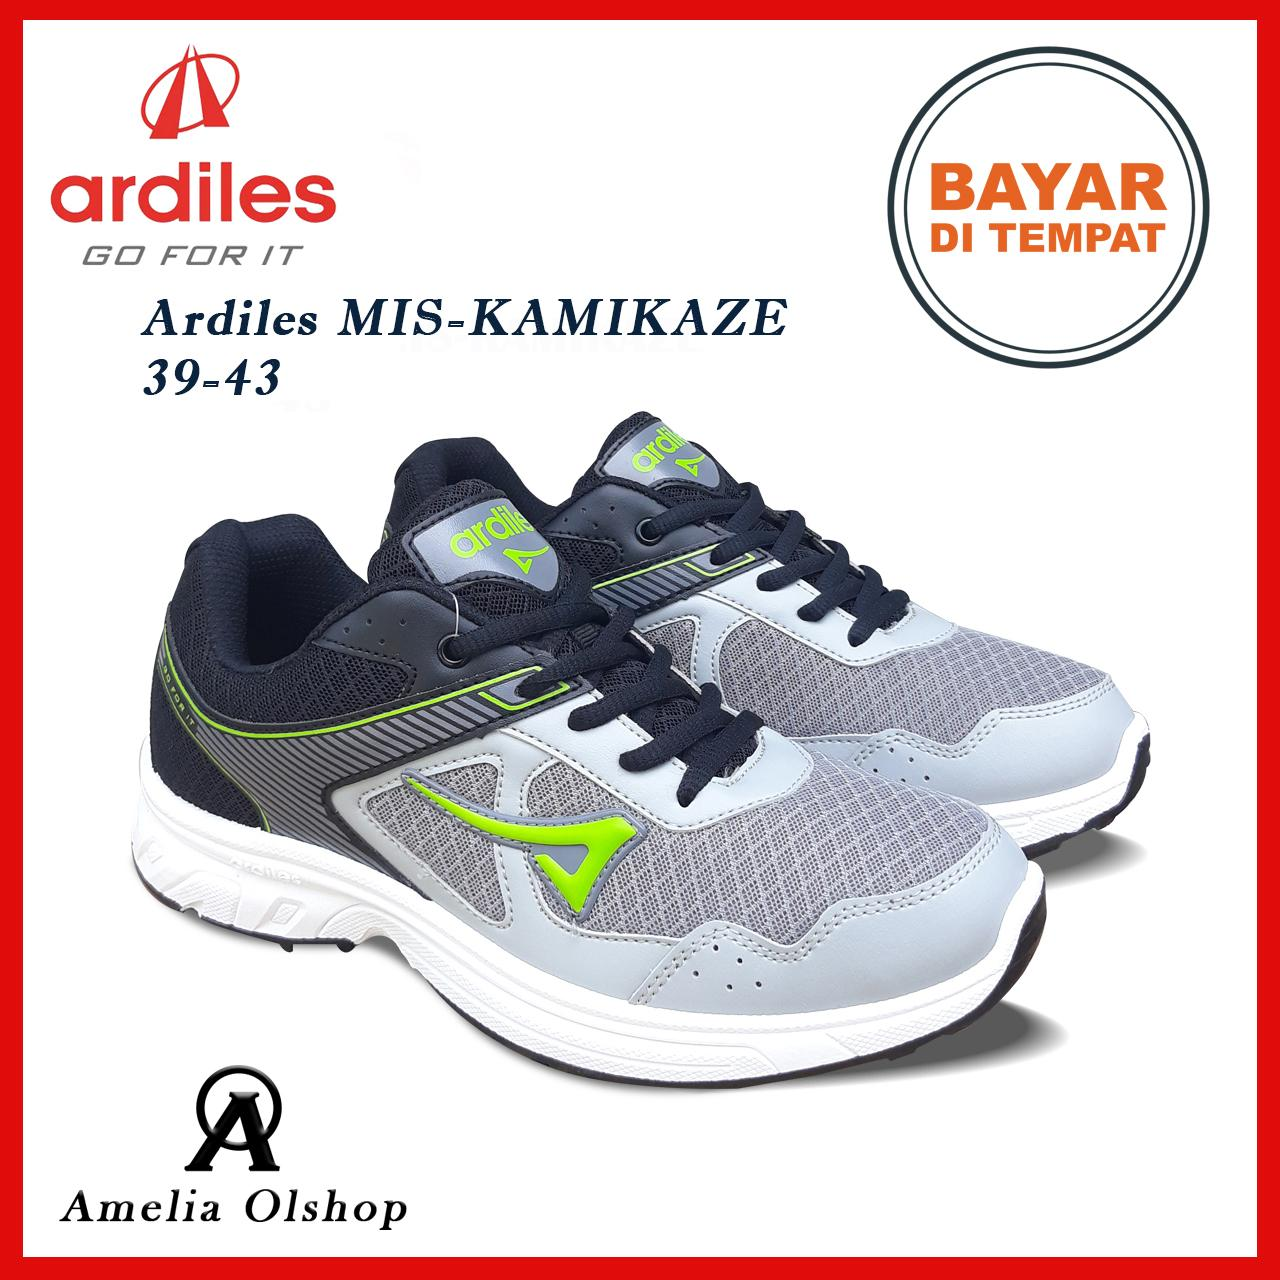 ... Harga Tas Indoland Termurah Terbaru. Source · Amelia Olshop - Sepatu  Ardiles MIS-KAMIKAZE 39-43   Sepatu Pria   Sepatu 31accd0bae